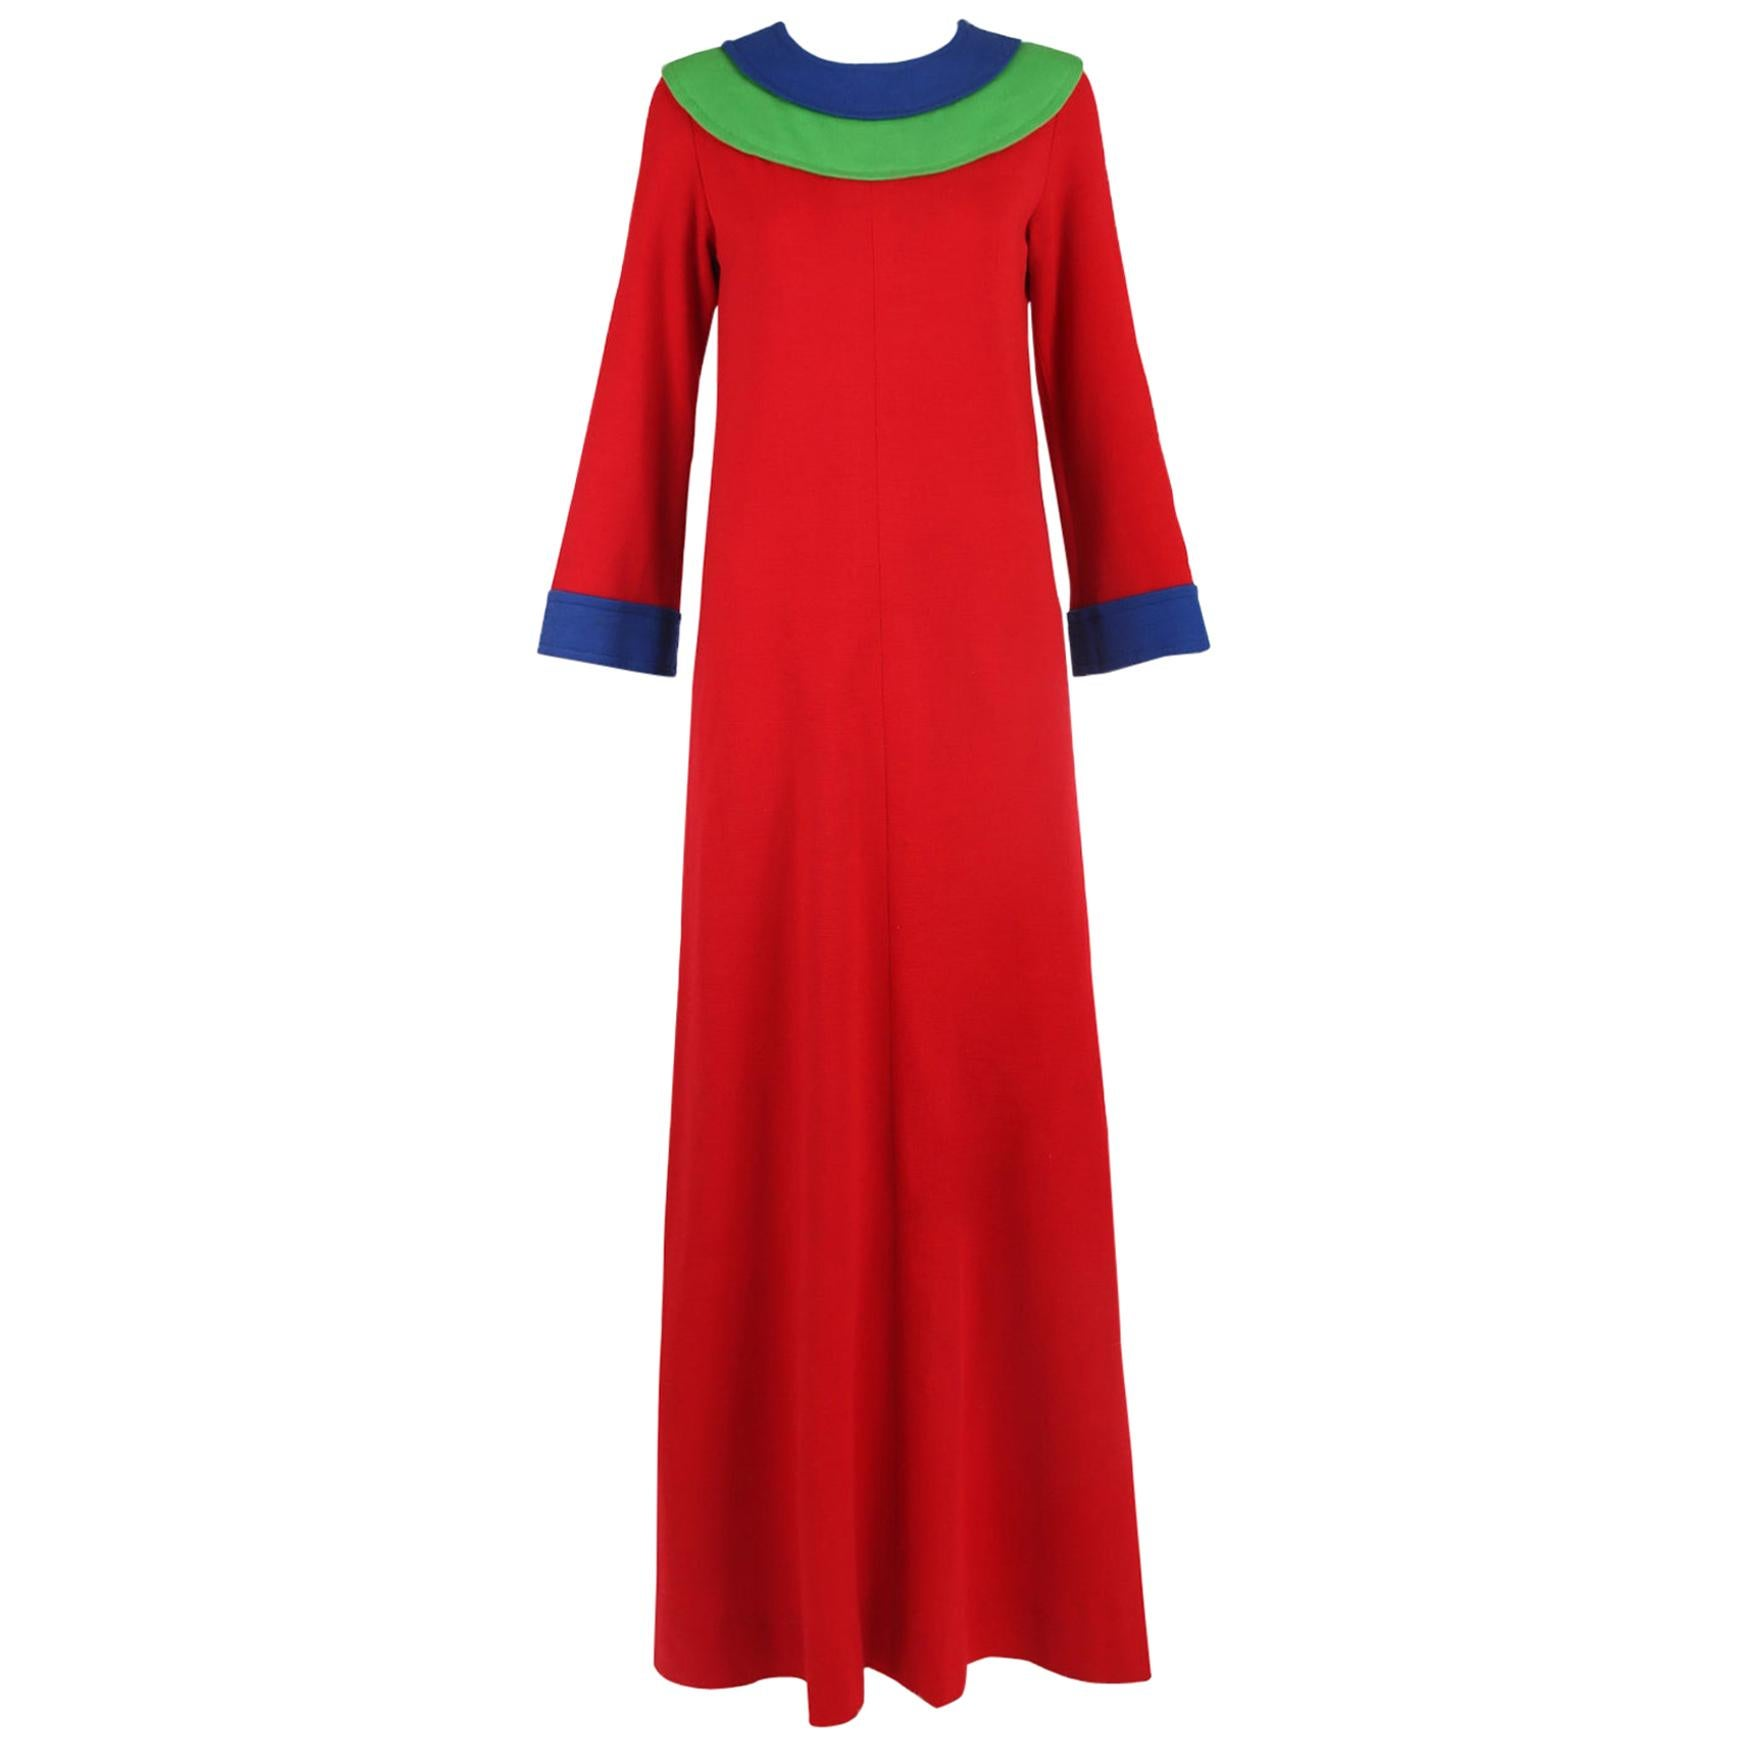 Yves Saint Laurent Red Wool Maxi Dress w/Blue & Green Colorblock Trim